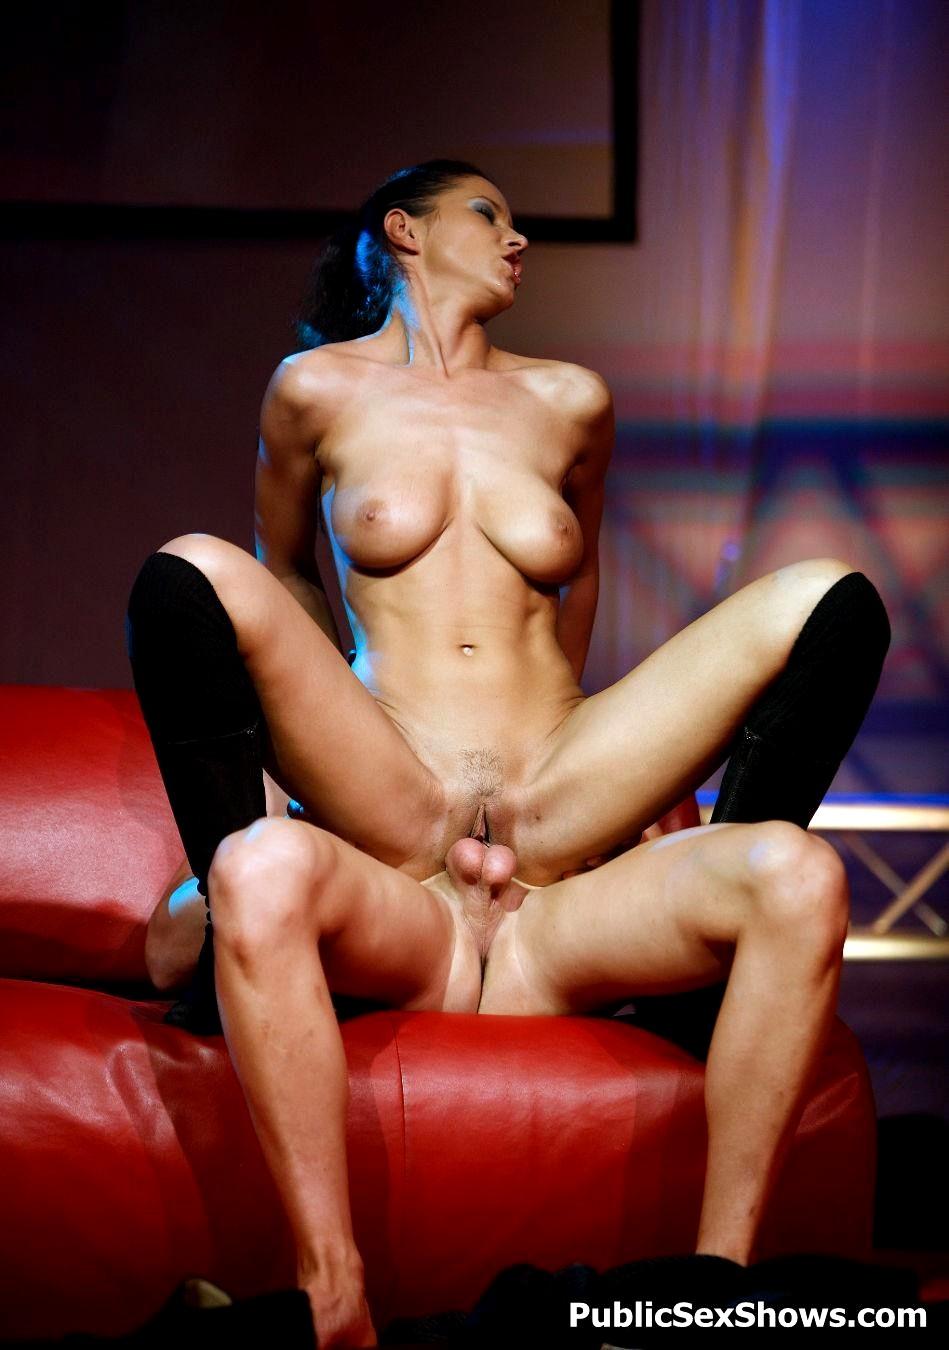 Brunette desi bitch rams pussy deep with dildo in webcam sex show